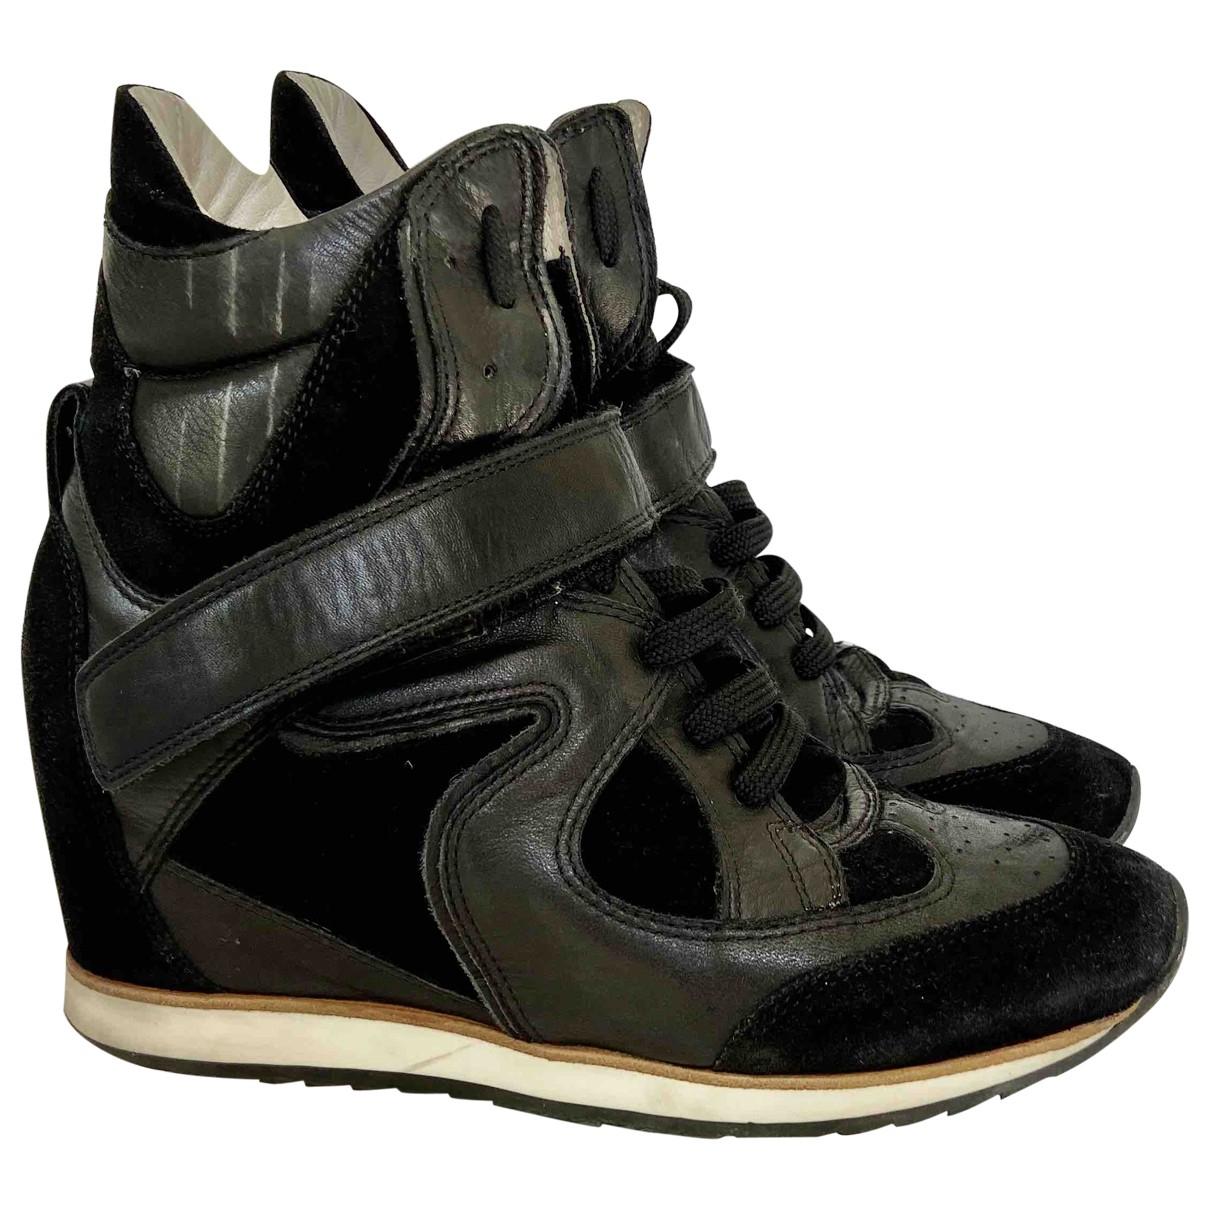 Elena Iachi \N Sneakers in  Schwarz Leder